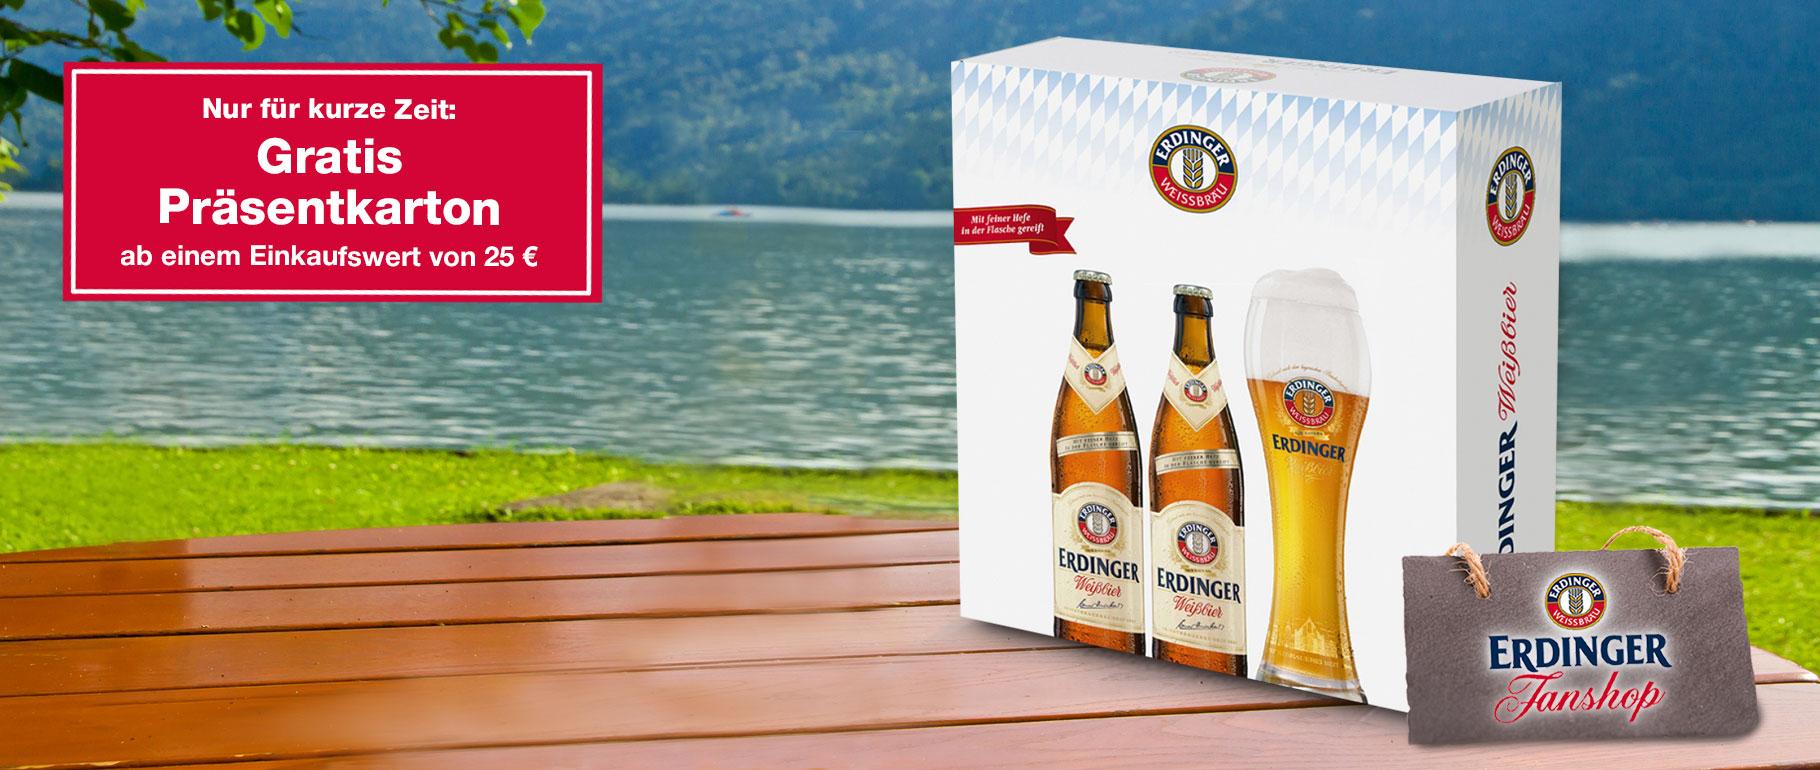 Wir feiern den Tag des Bieres...